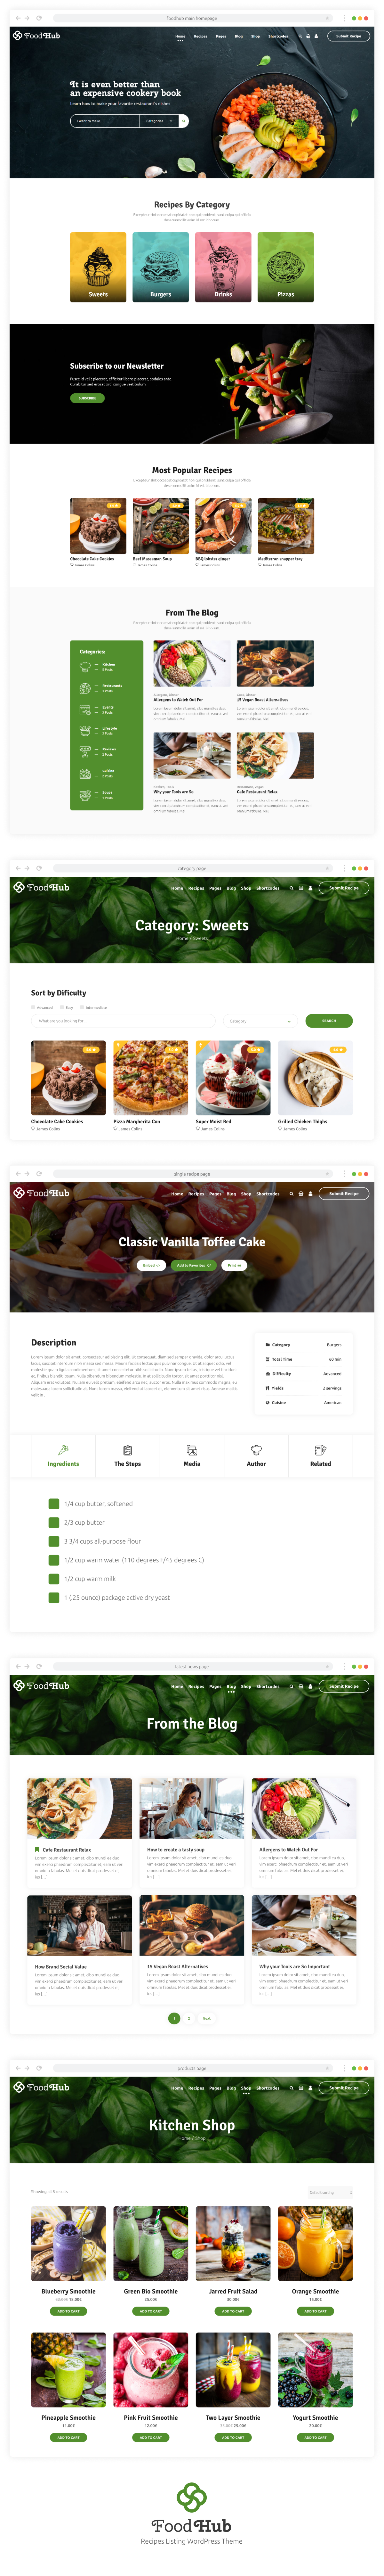 Foodhub - Recetas WordPress Theme - 1